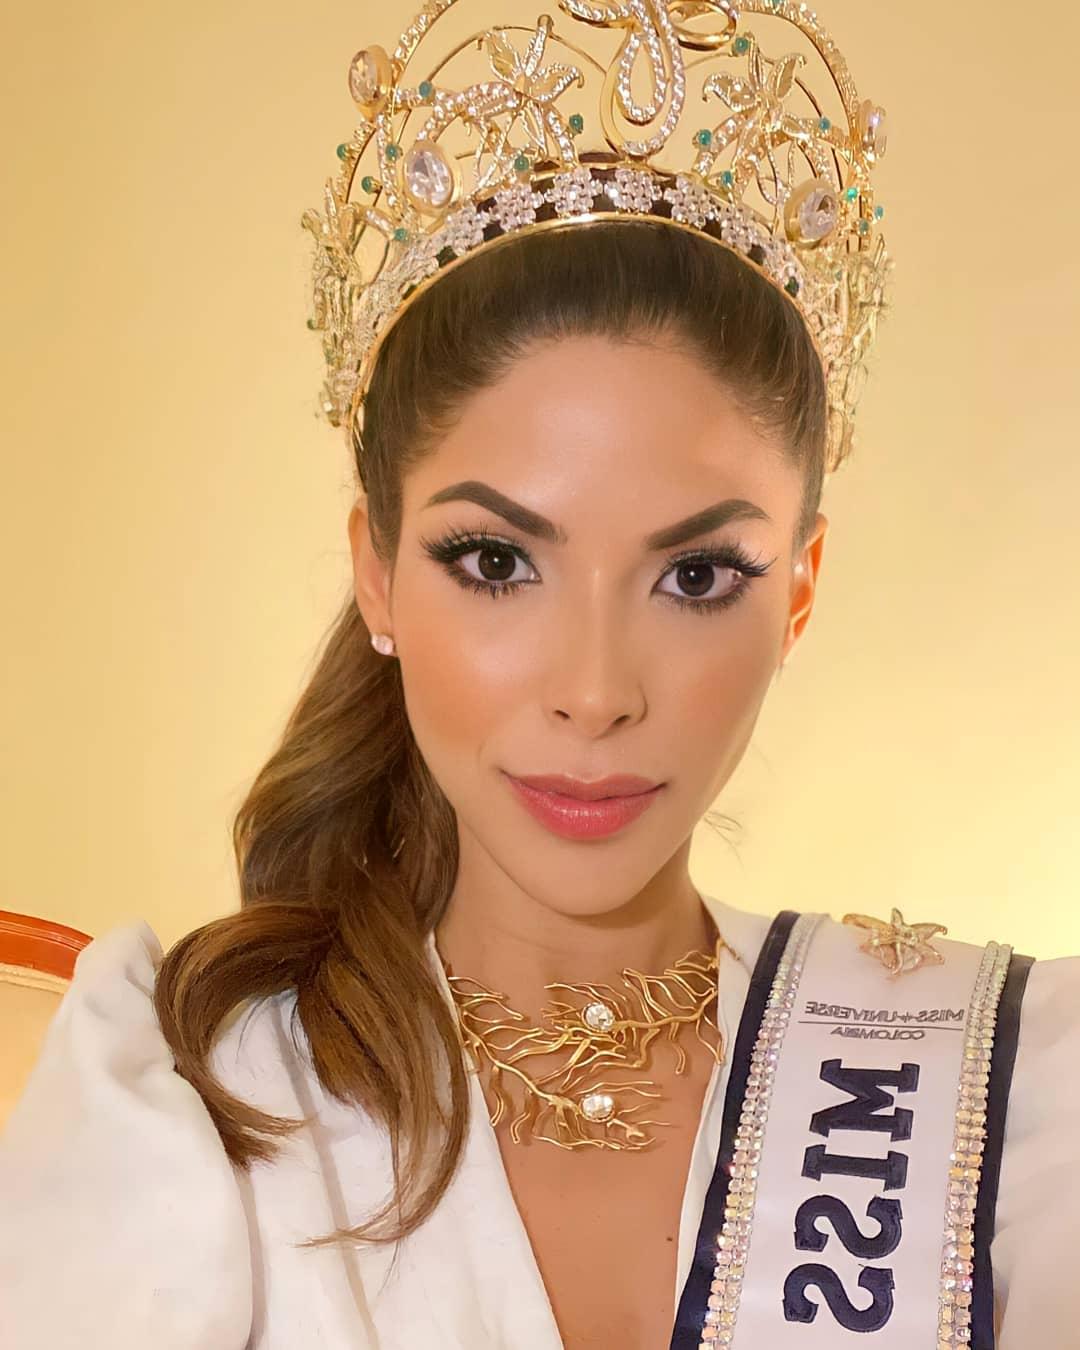 laura olascuaga, miss colombia universo 2020. - Página 5 Bellez20